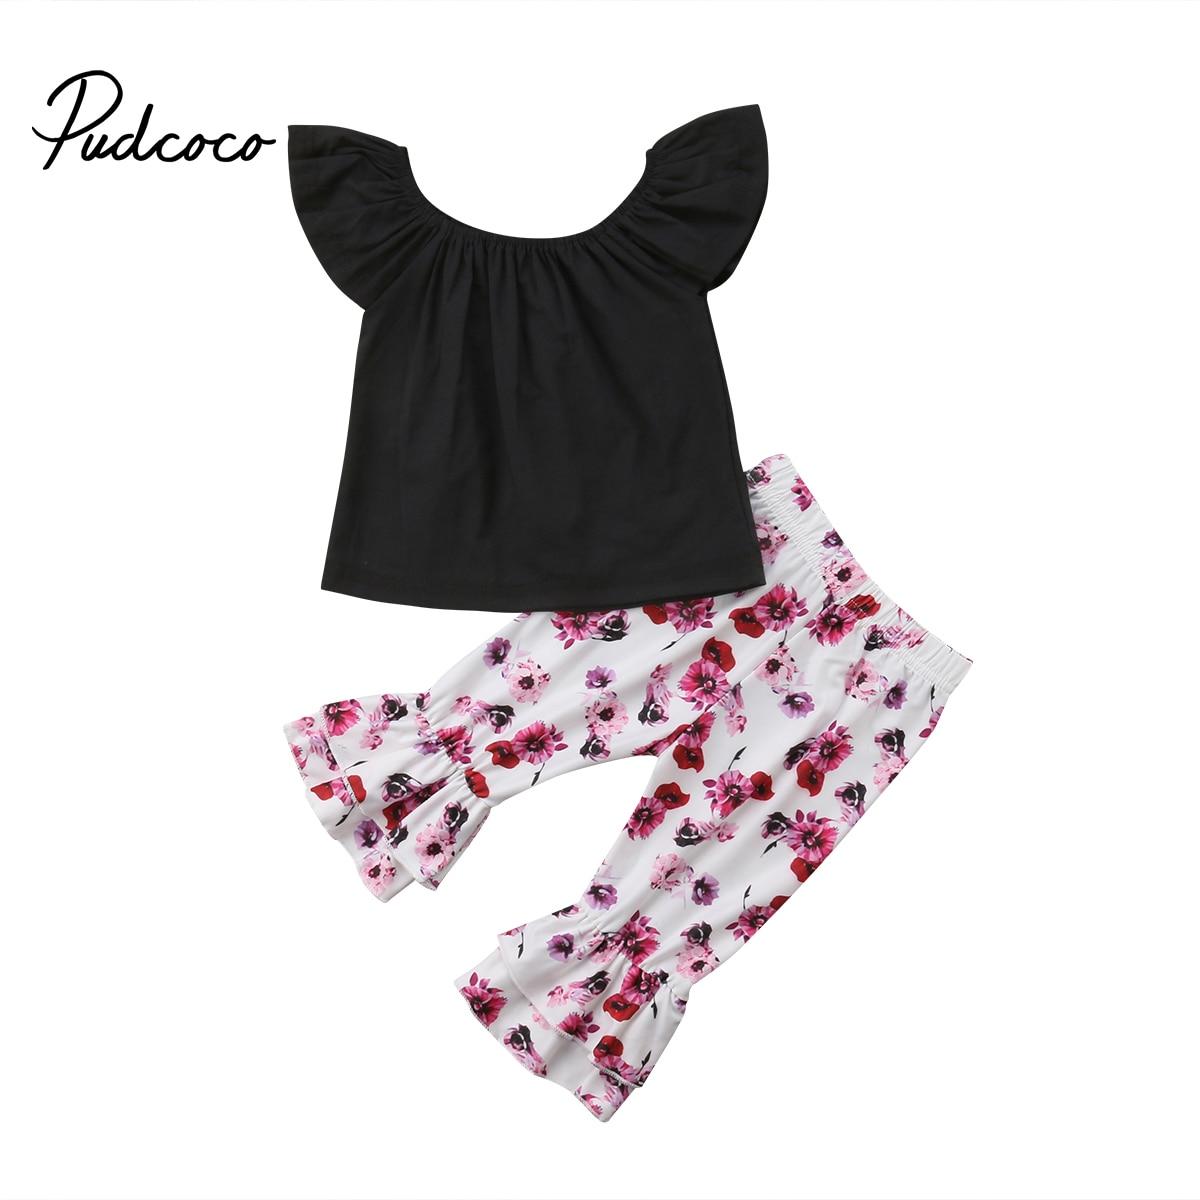 Newborn Kids Baby Girls Off Shoulder Tops T-shirt Floral Bell-bottomed Pants Children Clothes